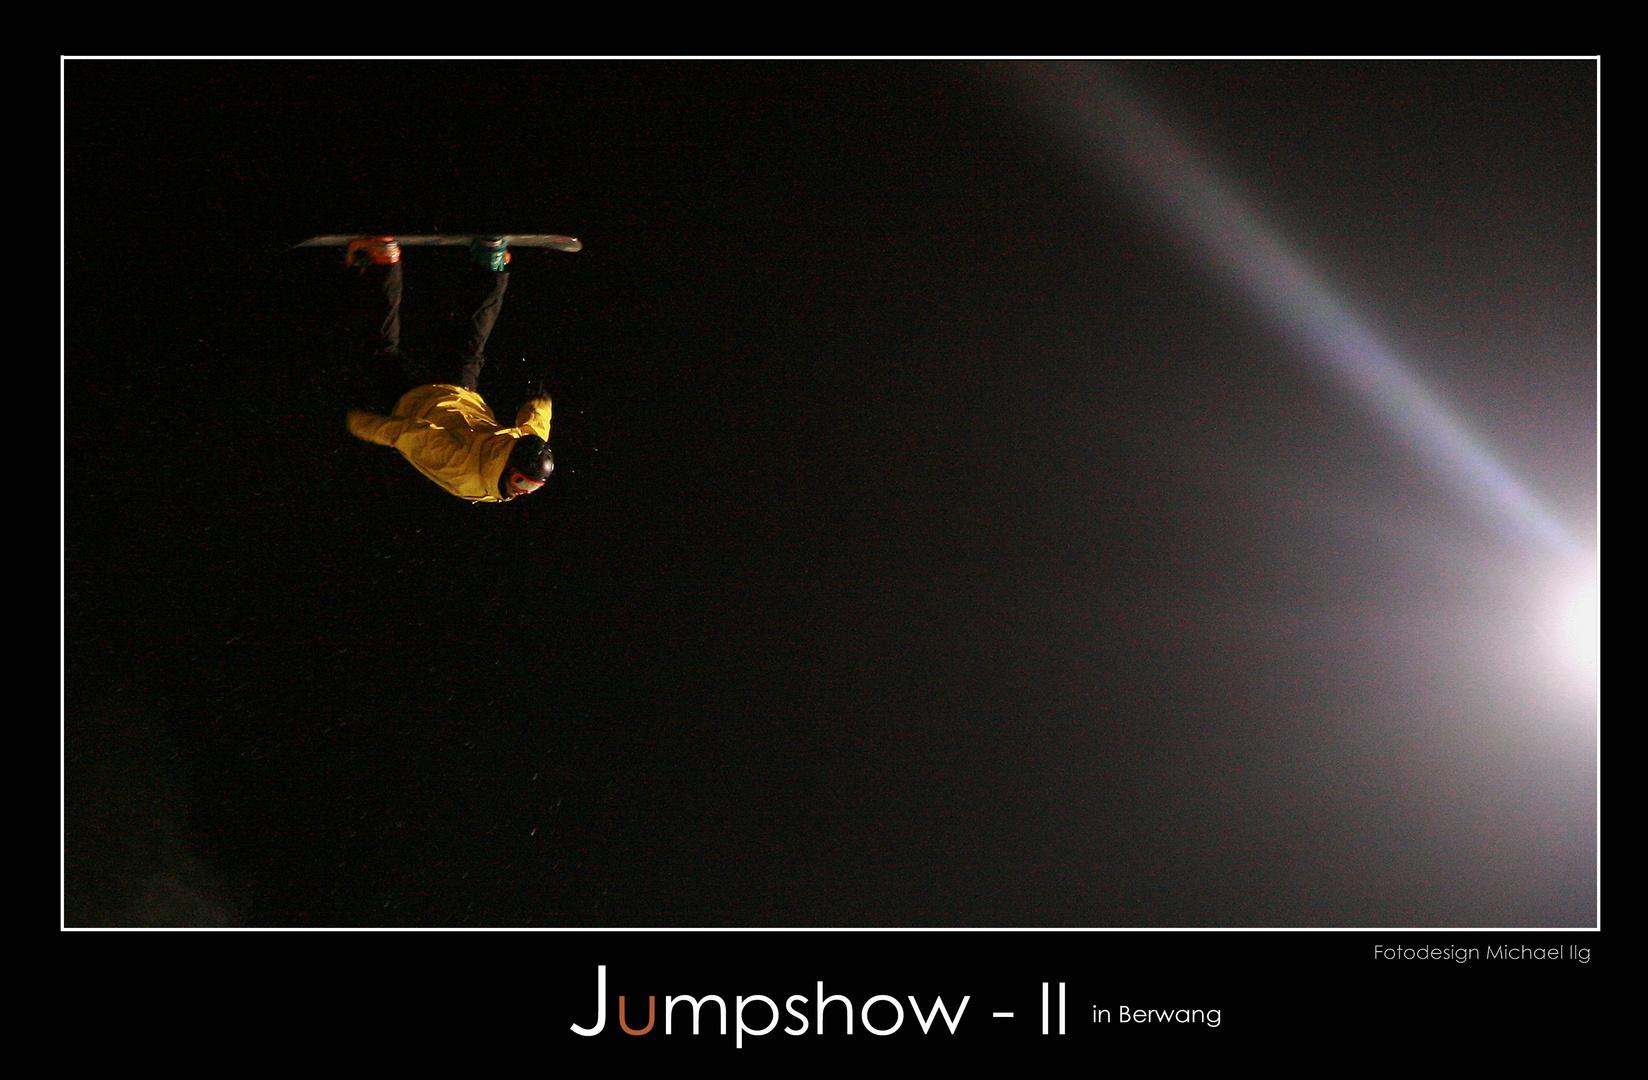 Jumpshow II - Berwang